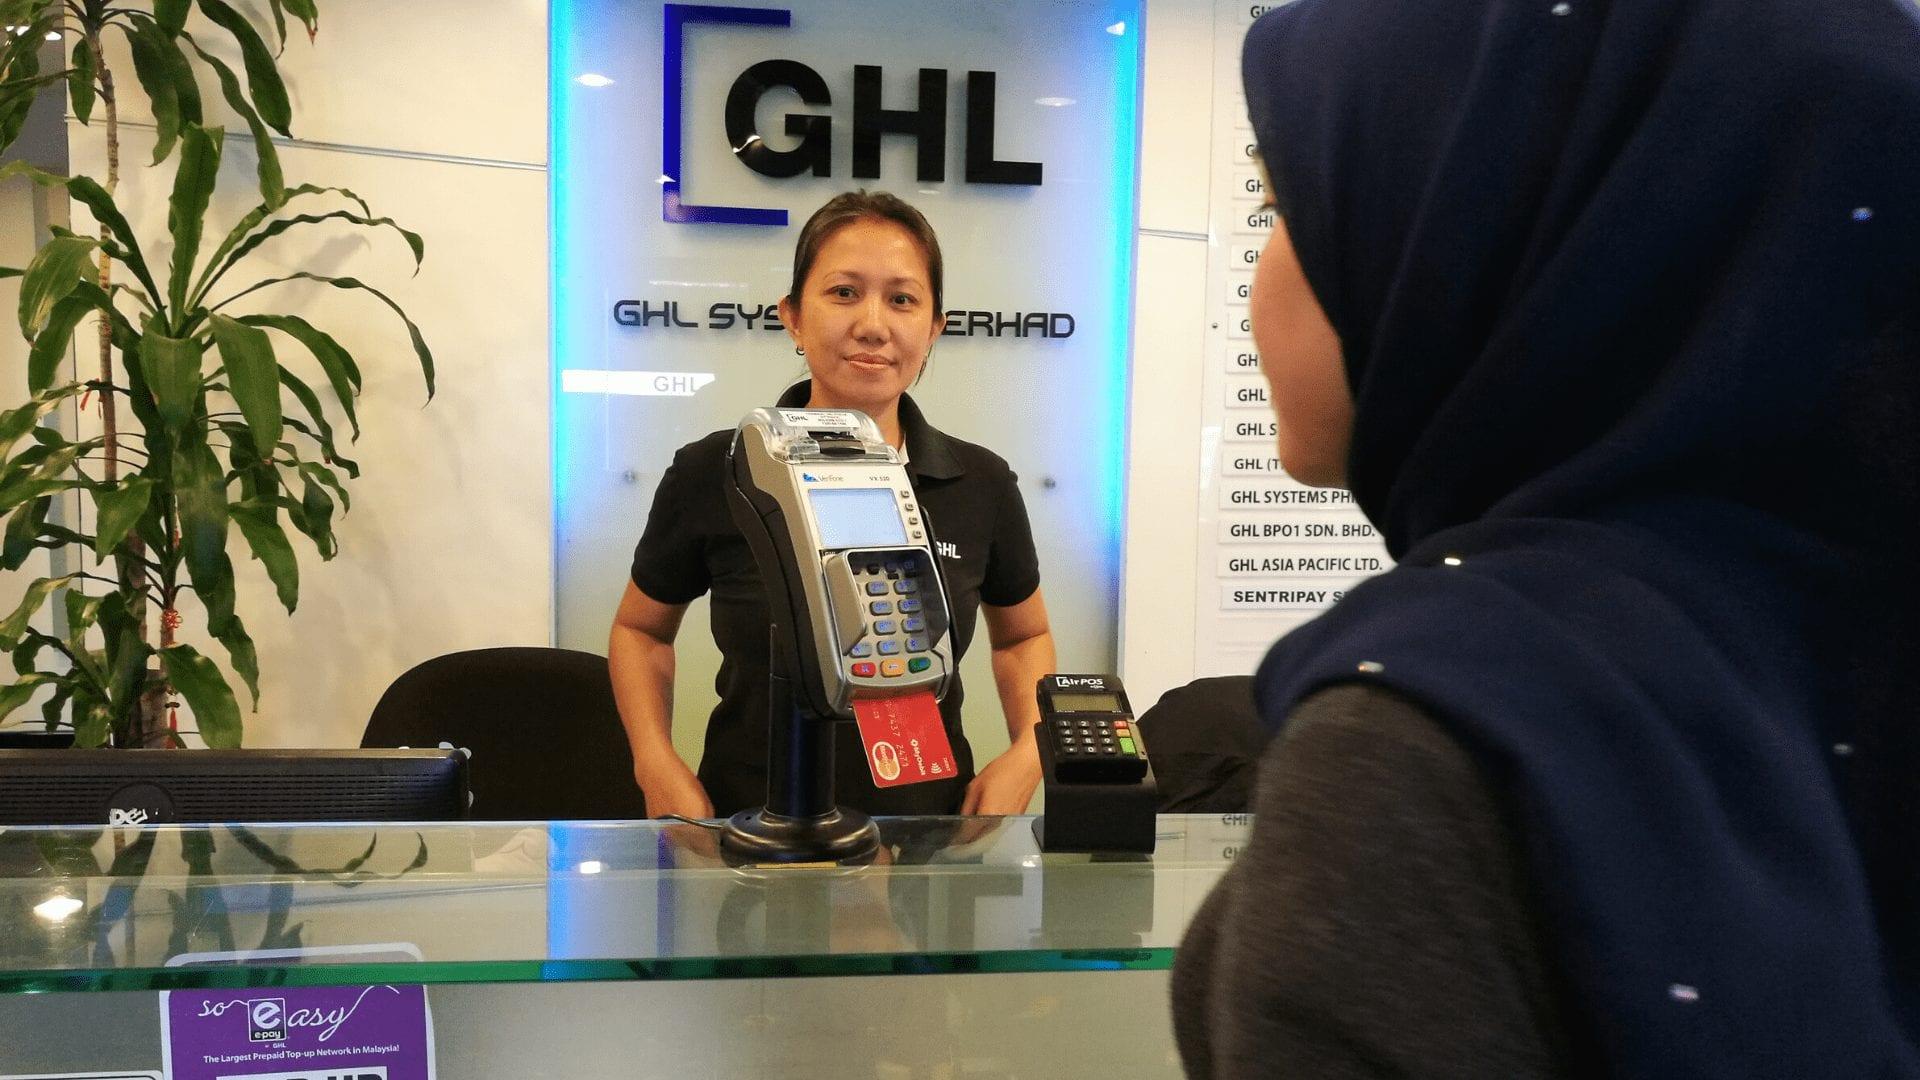 GHL Systems Berhad